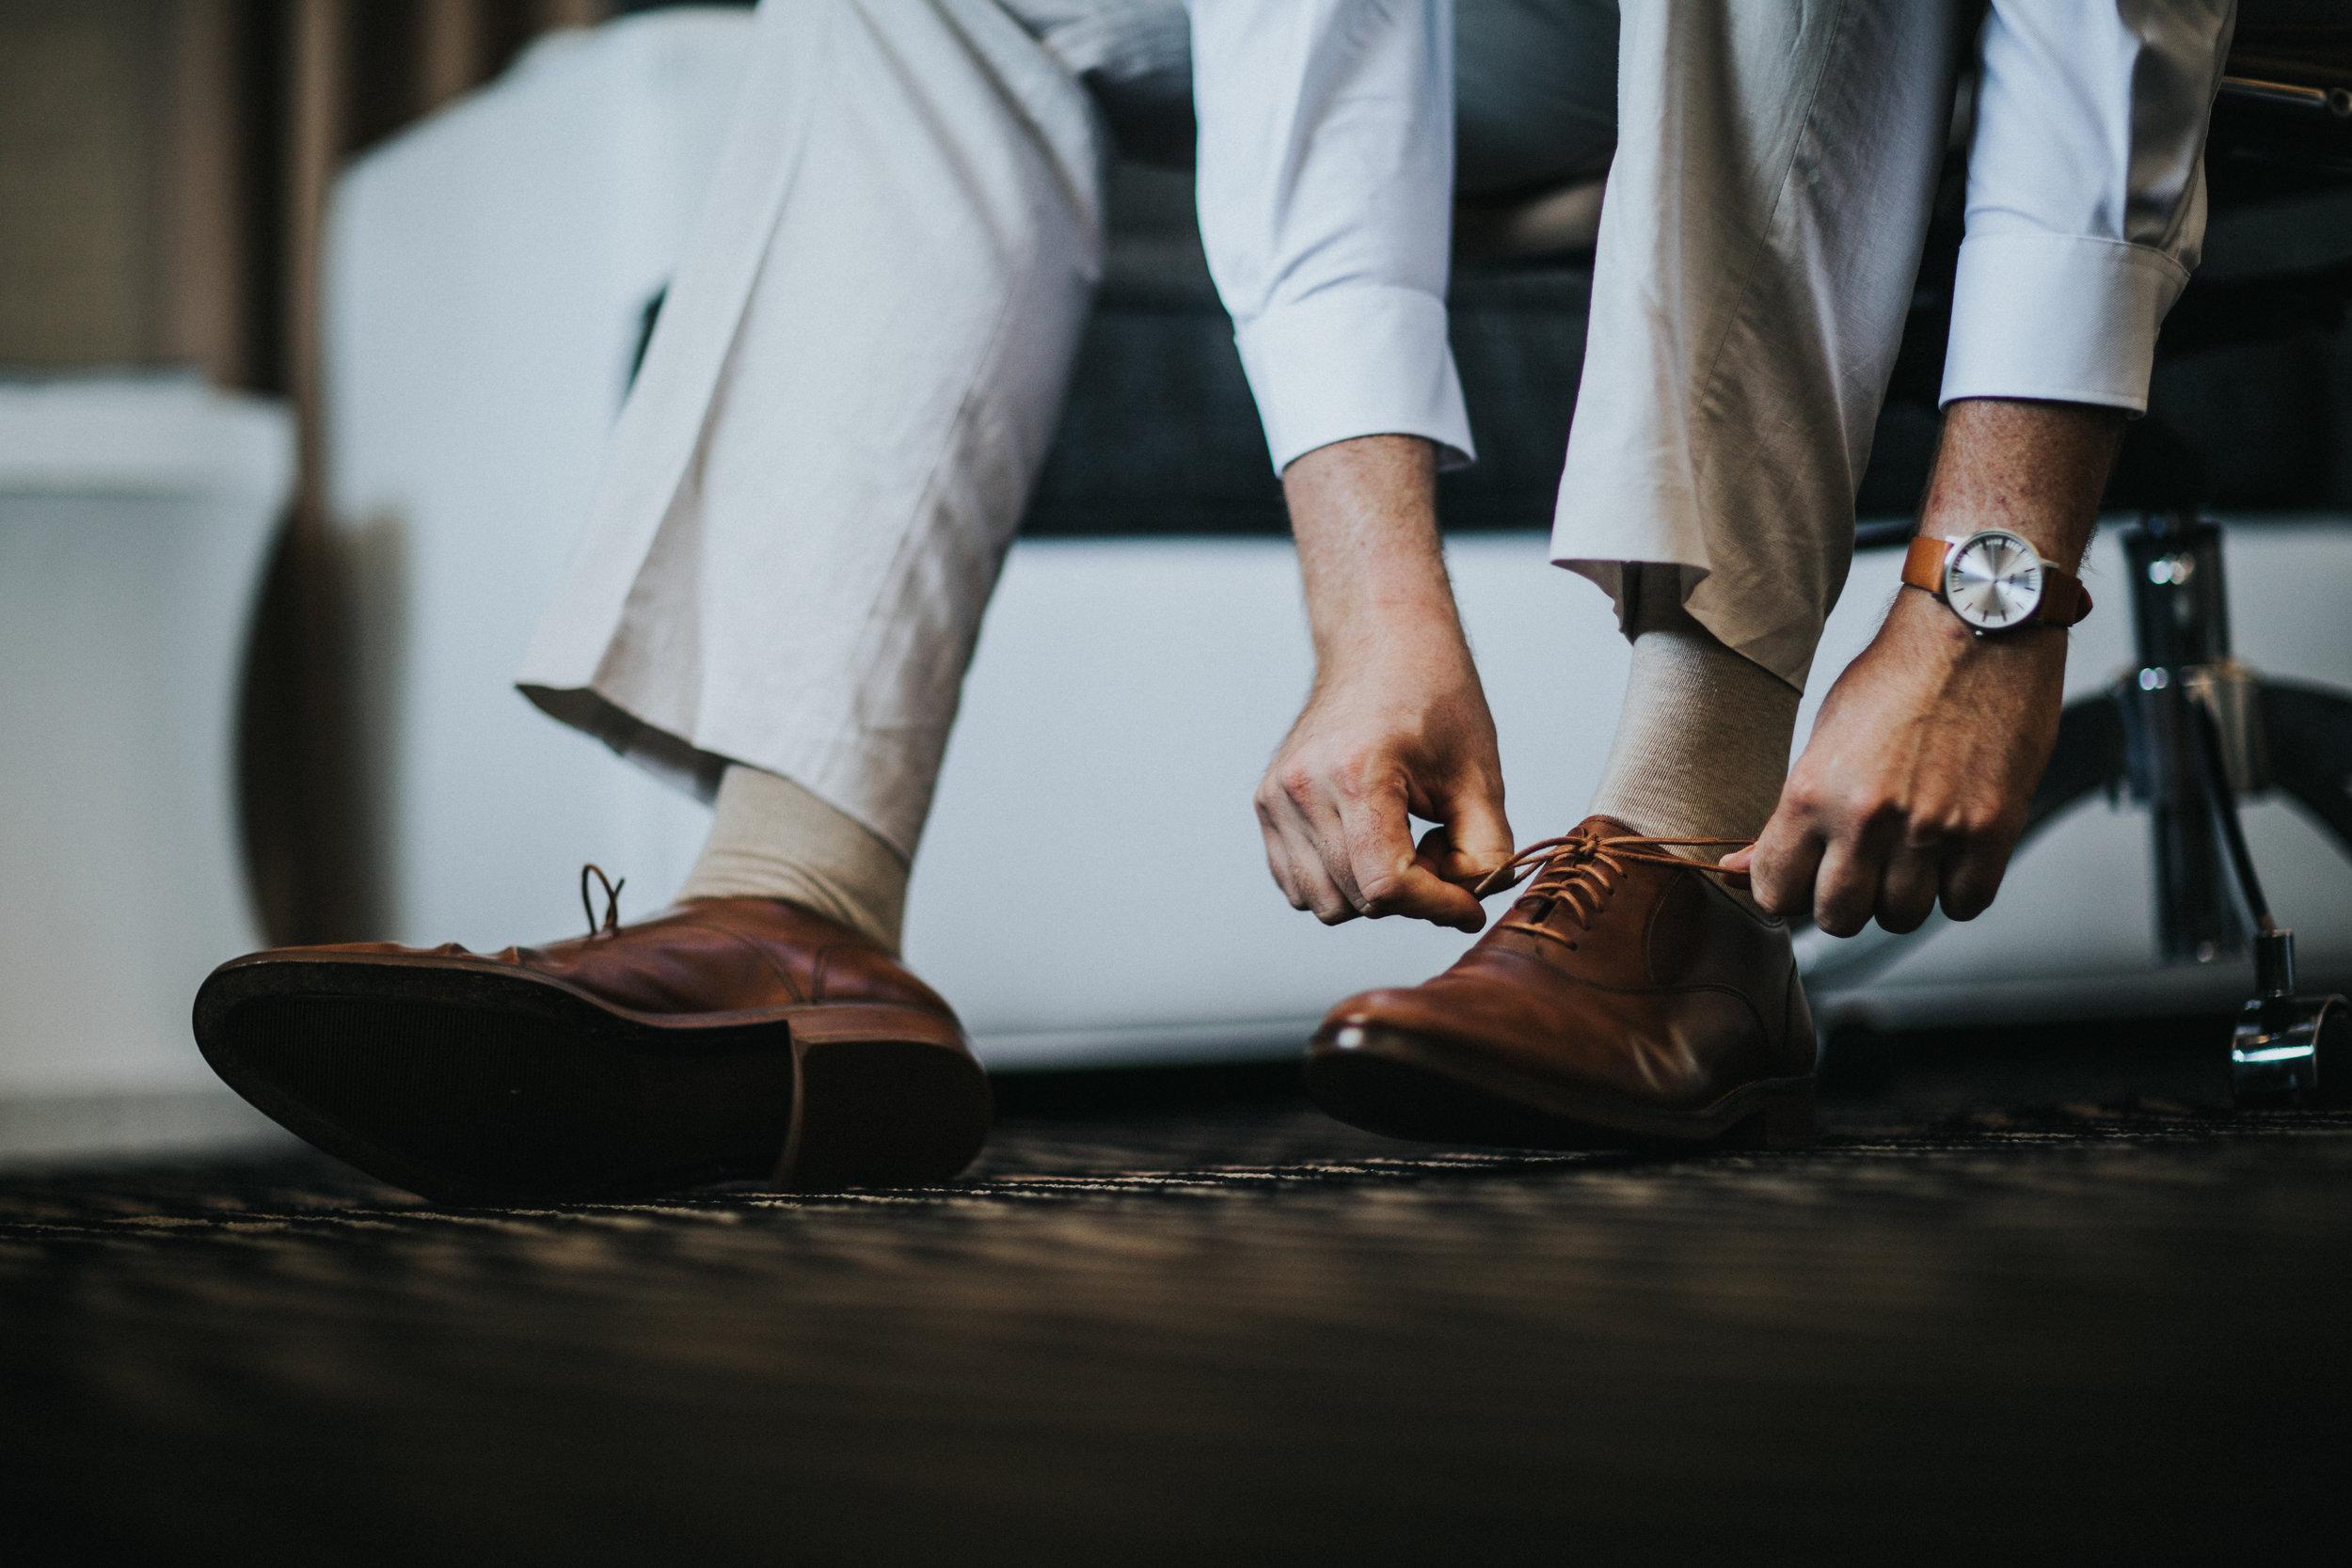 JennaLynnPhotography-NJWeddingPhotographer-Wedding-TheBerkeley-AsburyPark-Allison&Michael-GettingReady-59.jpg